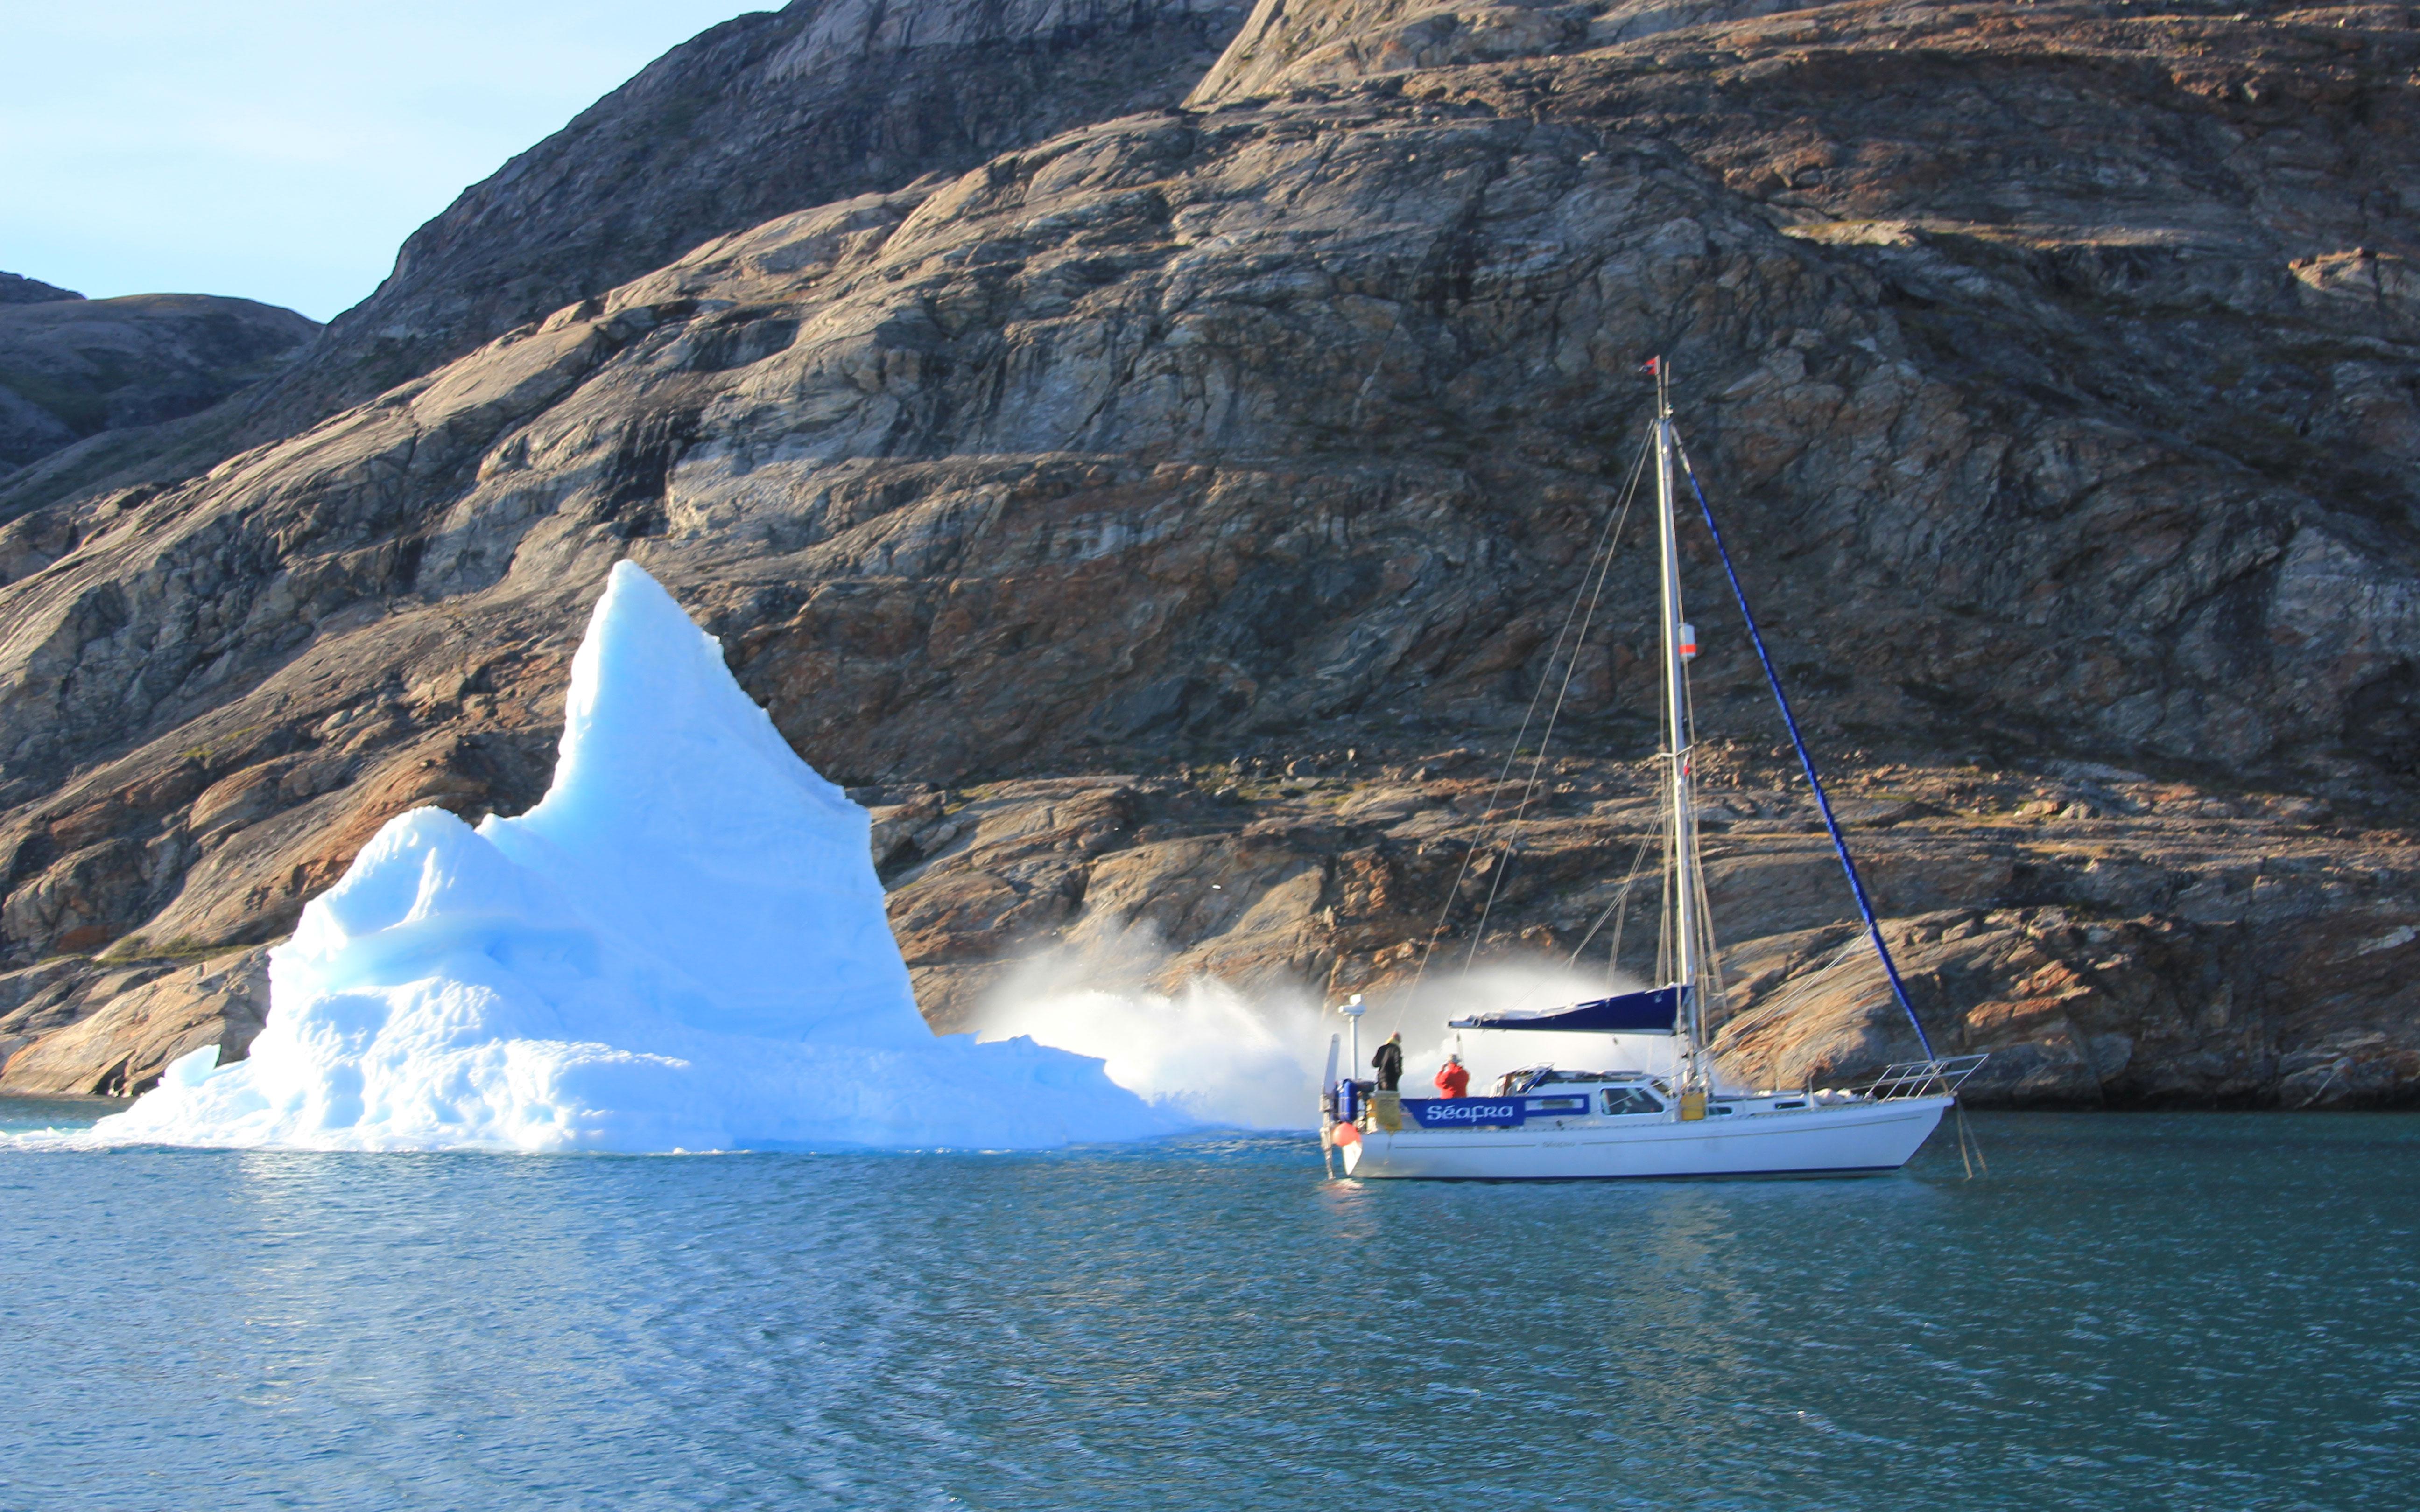 New Brian Black Memorial Award for marine environmental journalism - Yachting Monthly